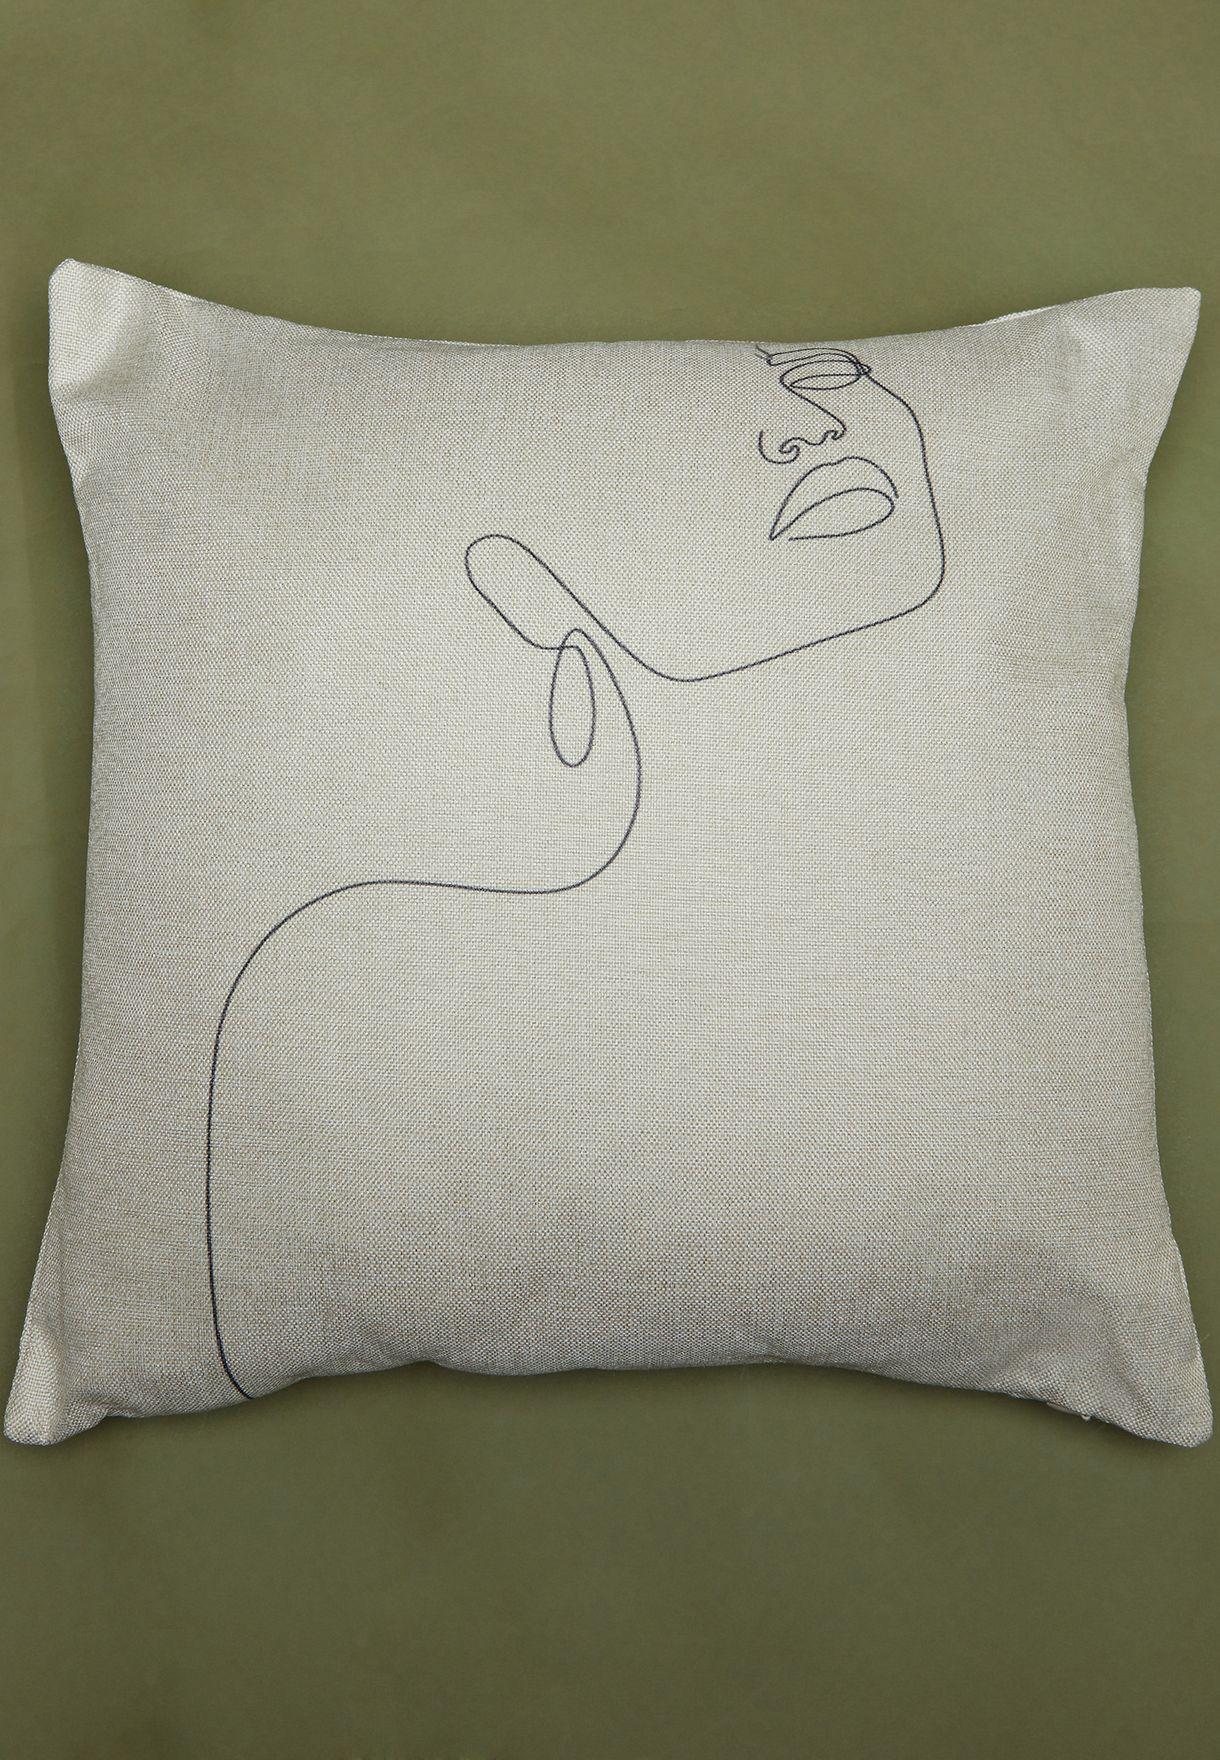 Illustration Print Cushion With Insert 45cm x 45cm